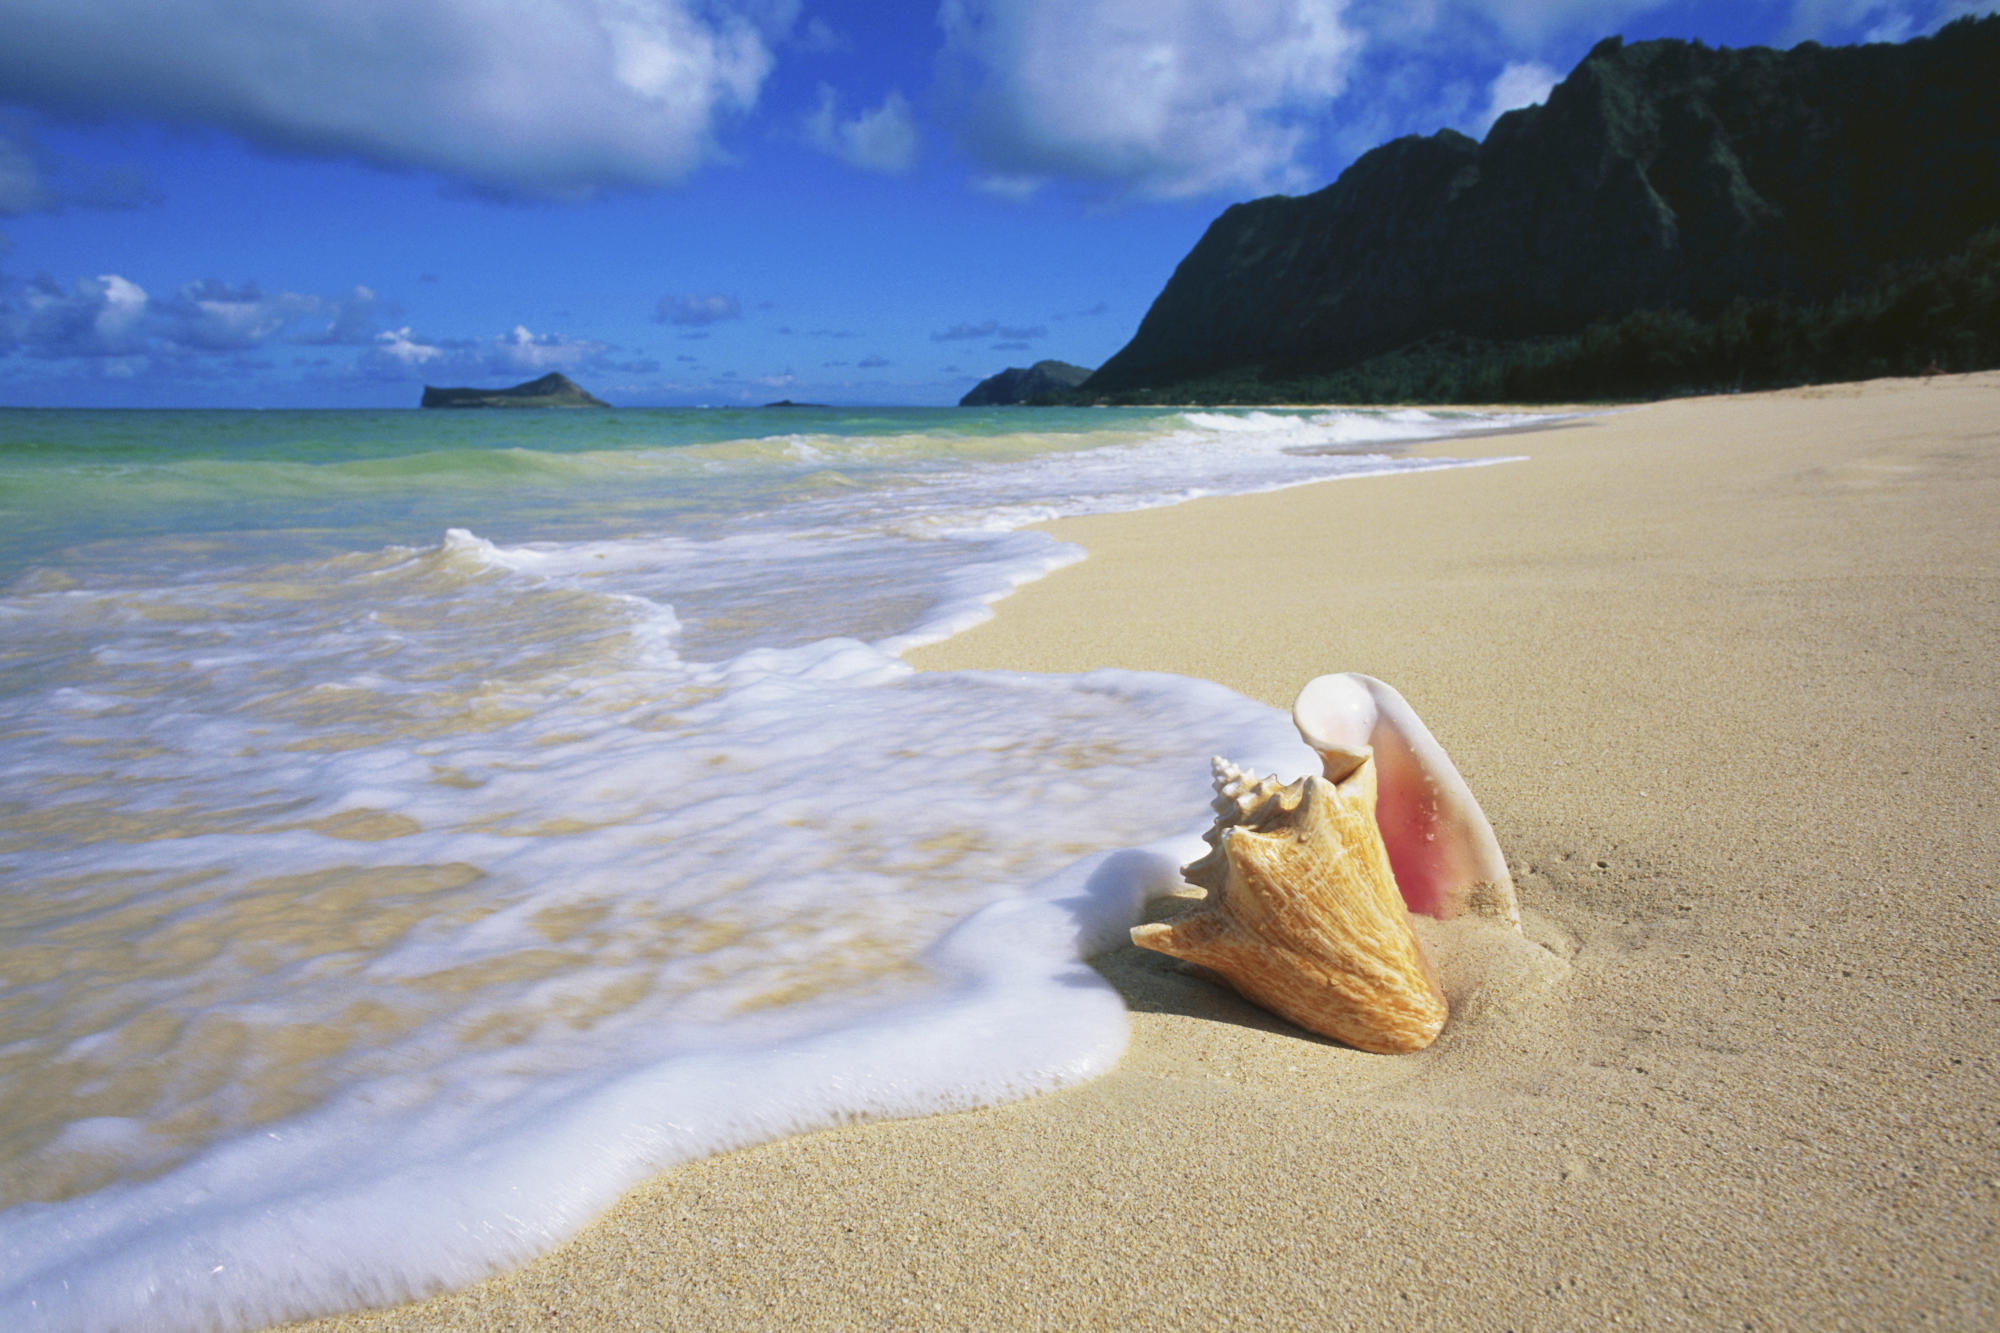 cool beach hd image wallpaper free download   HD 2000x1333